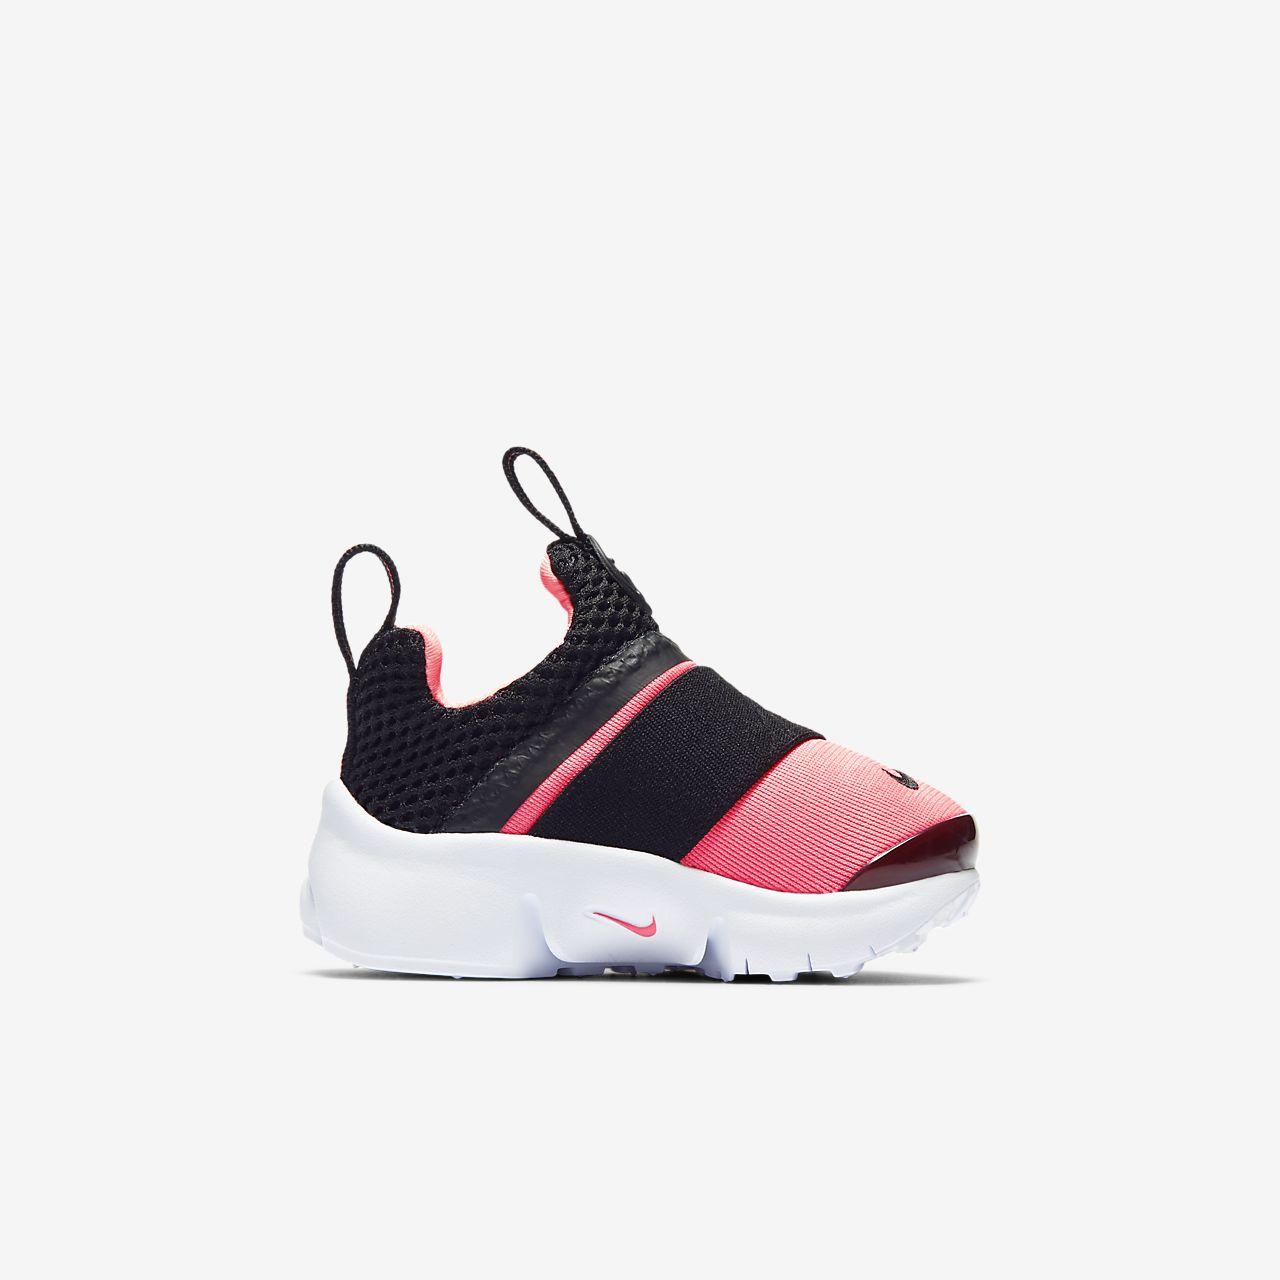 ... Nike Presto Extreme Baby & Toddler Shoe